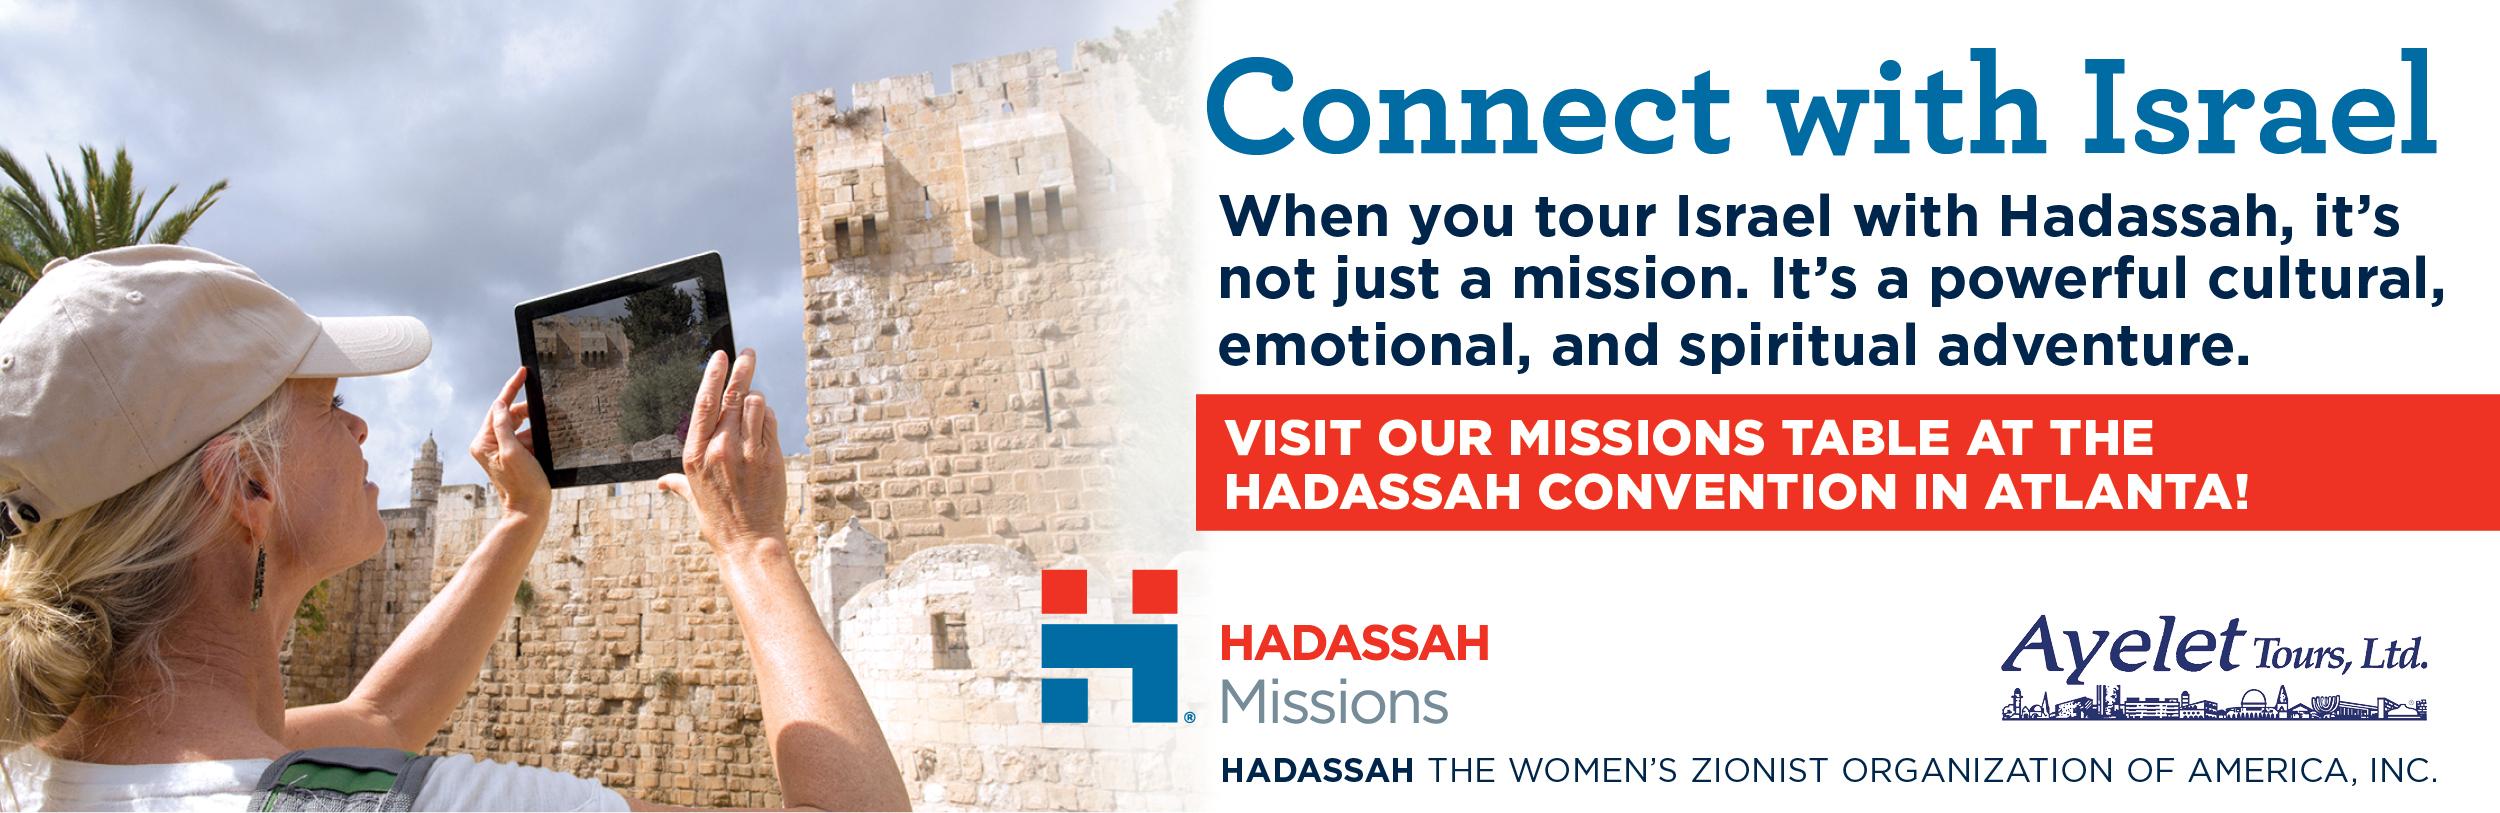 Hadassah Missions